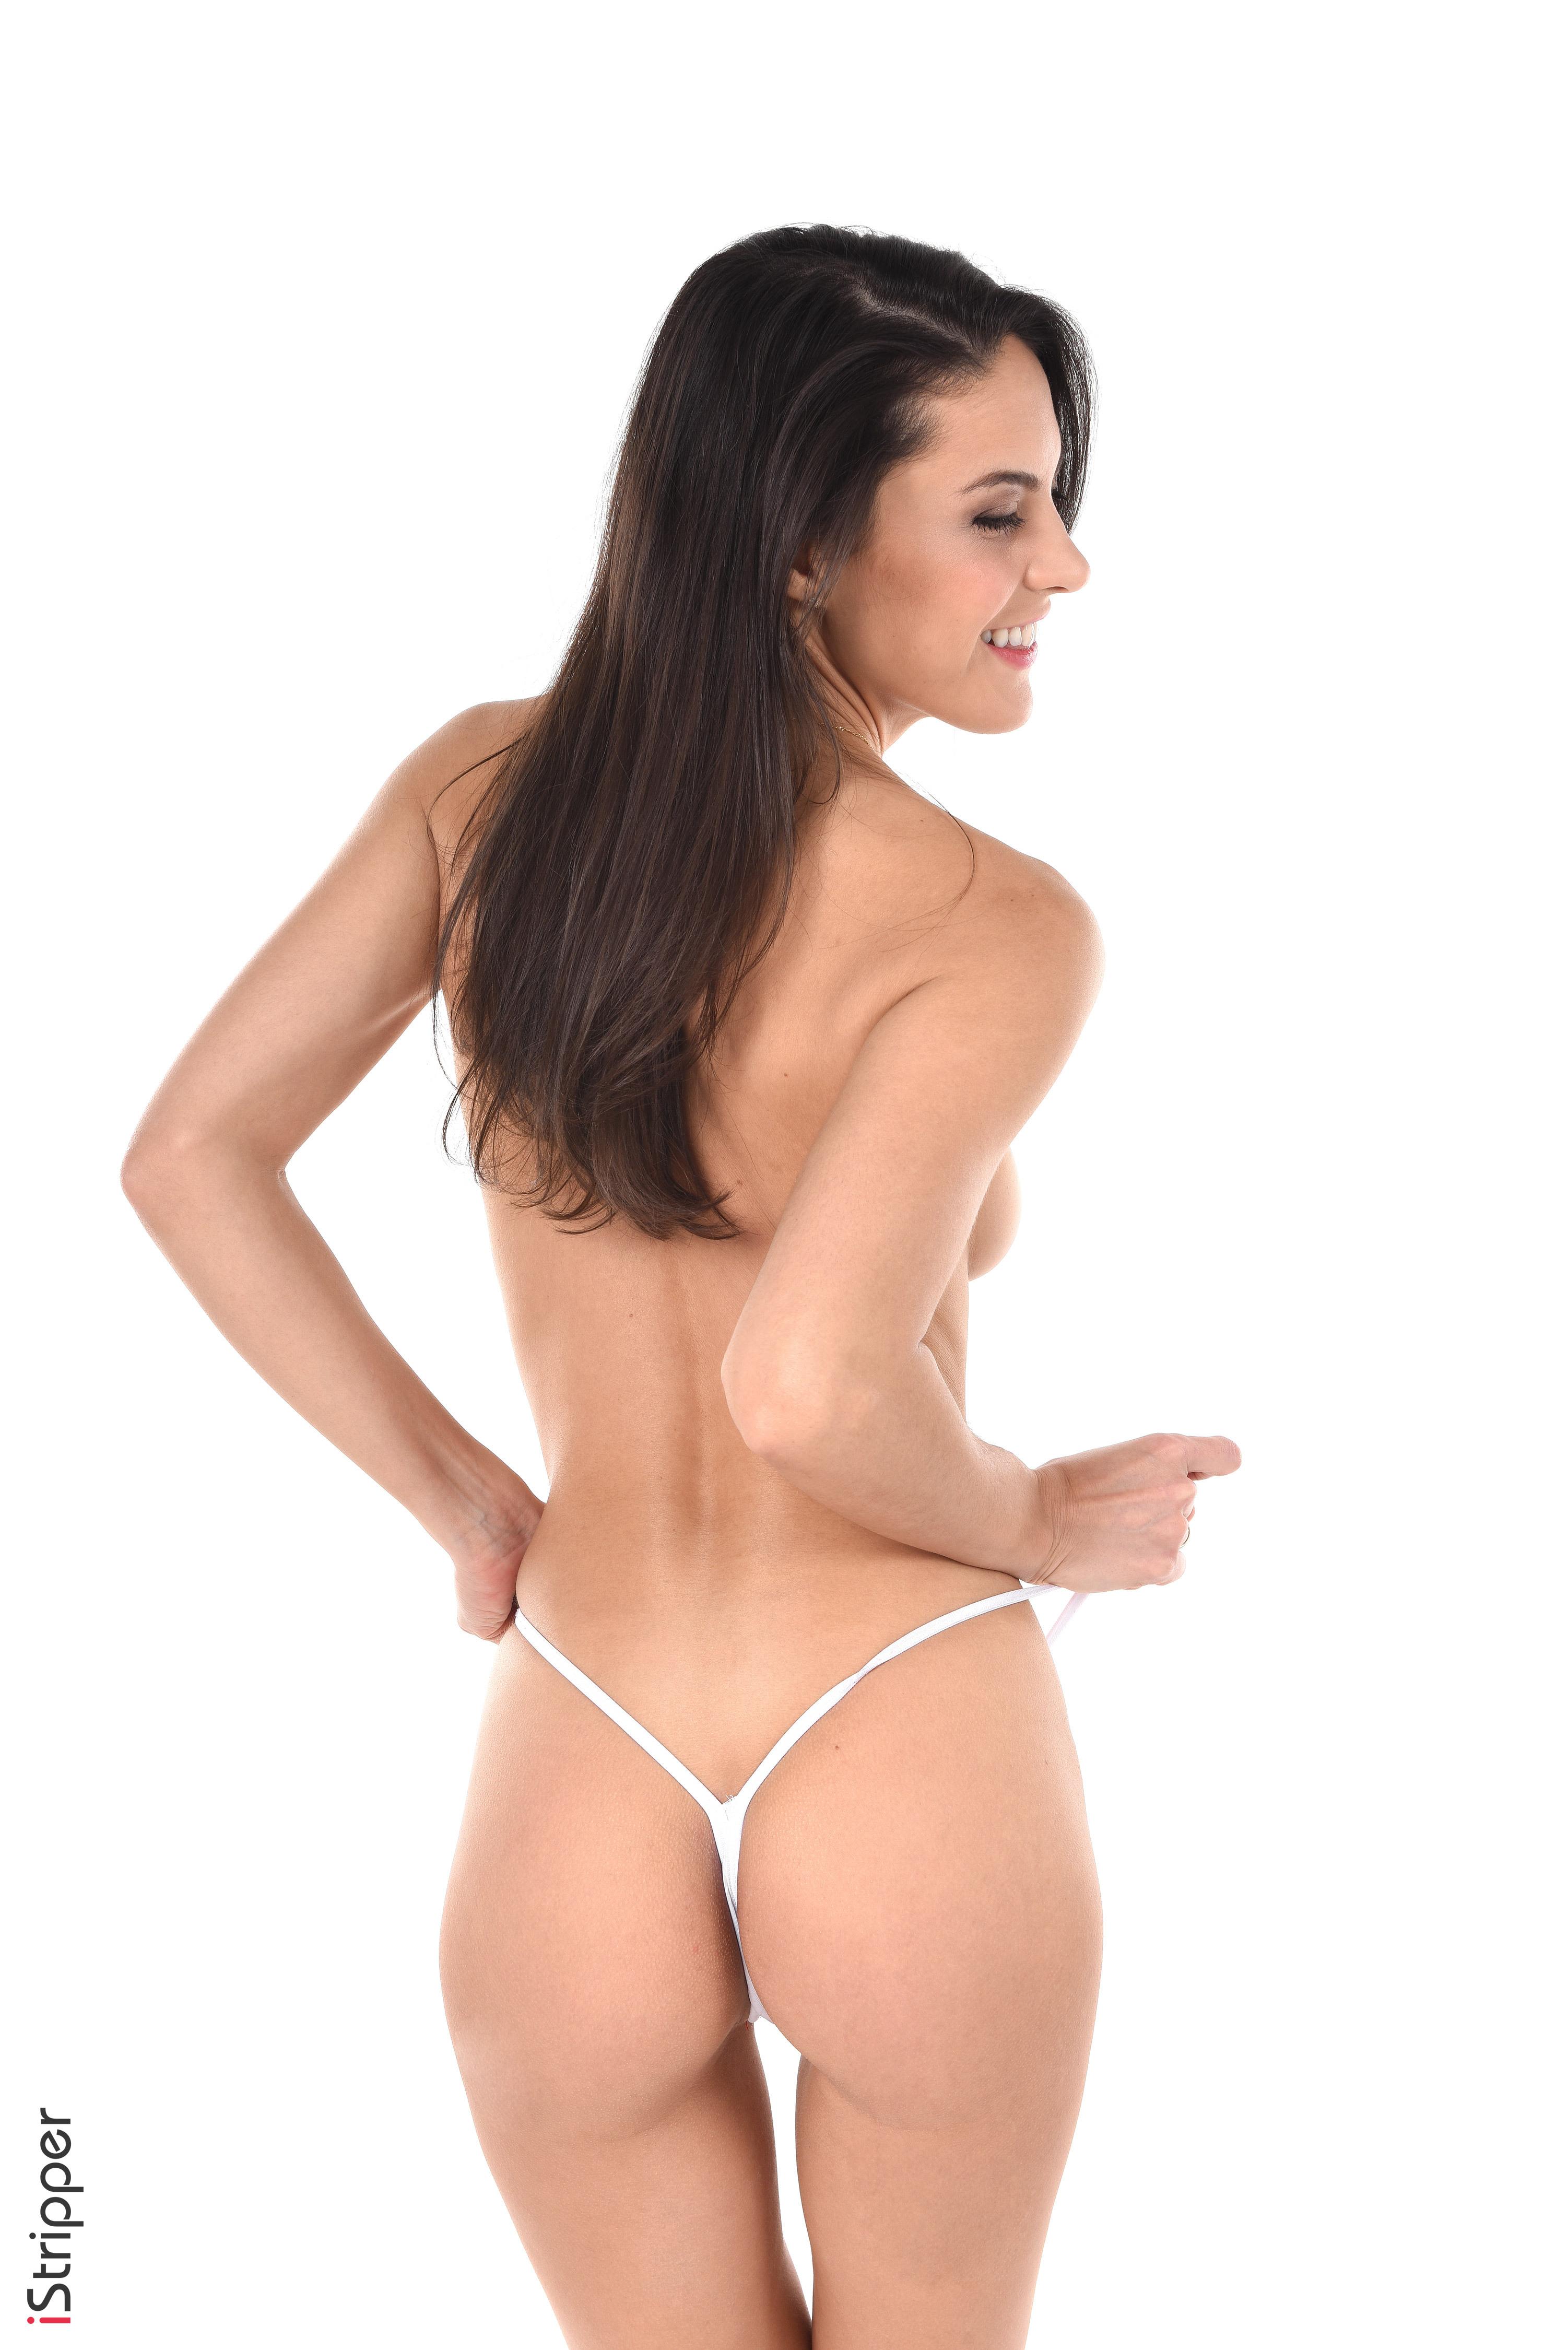 desktop models strippers